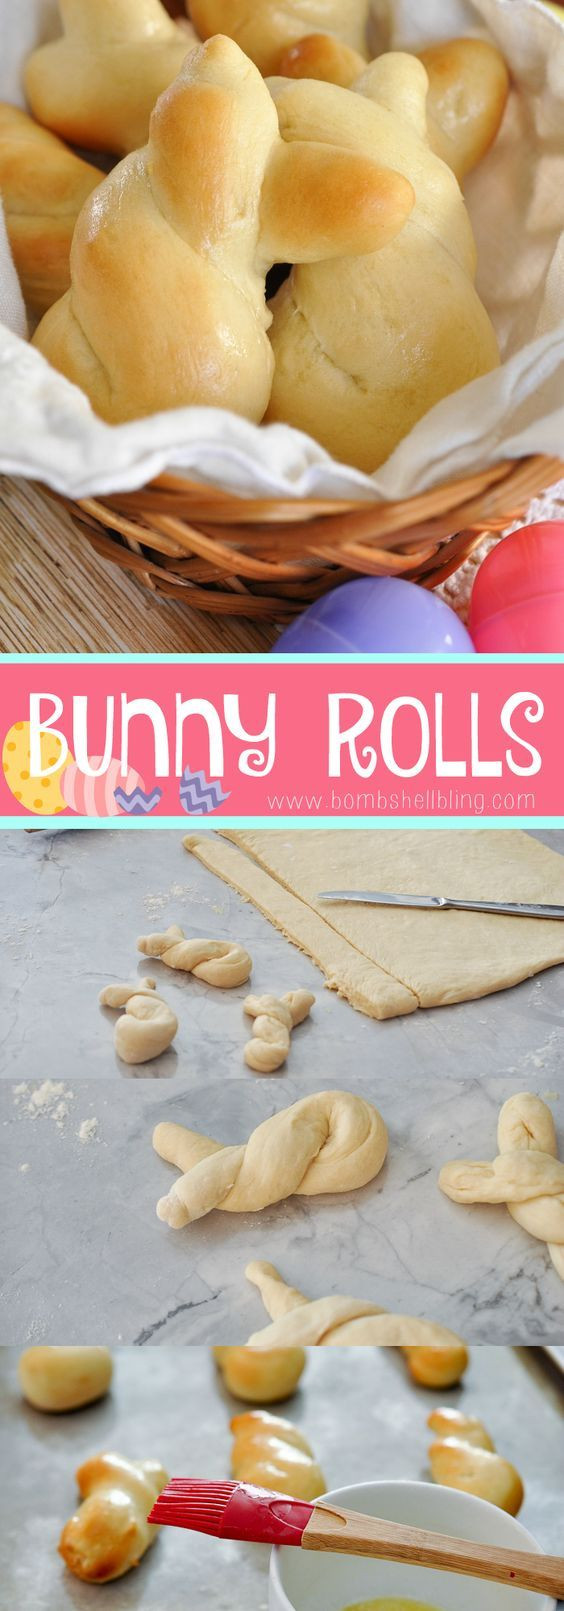 Easter Dinner Rolls  Easter Bunny Rolls Recipe